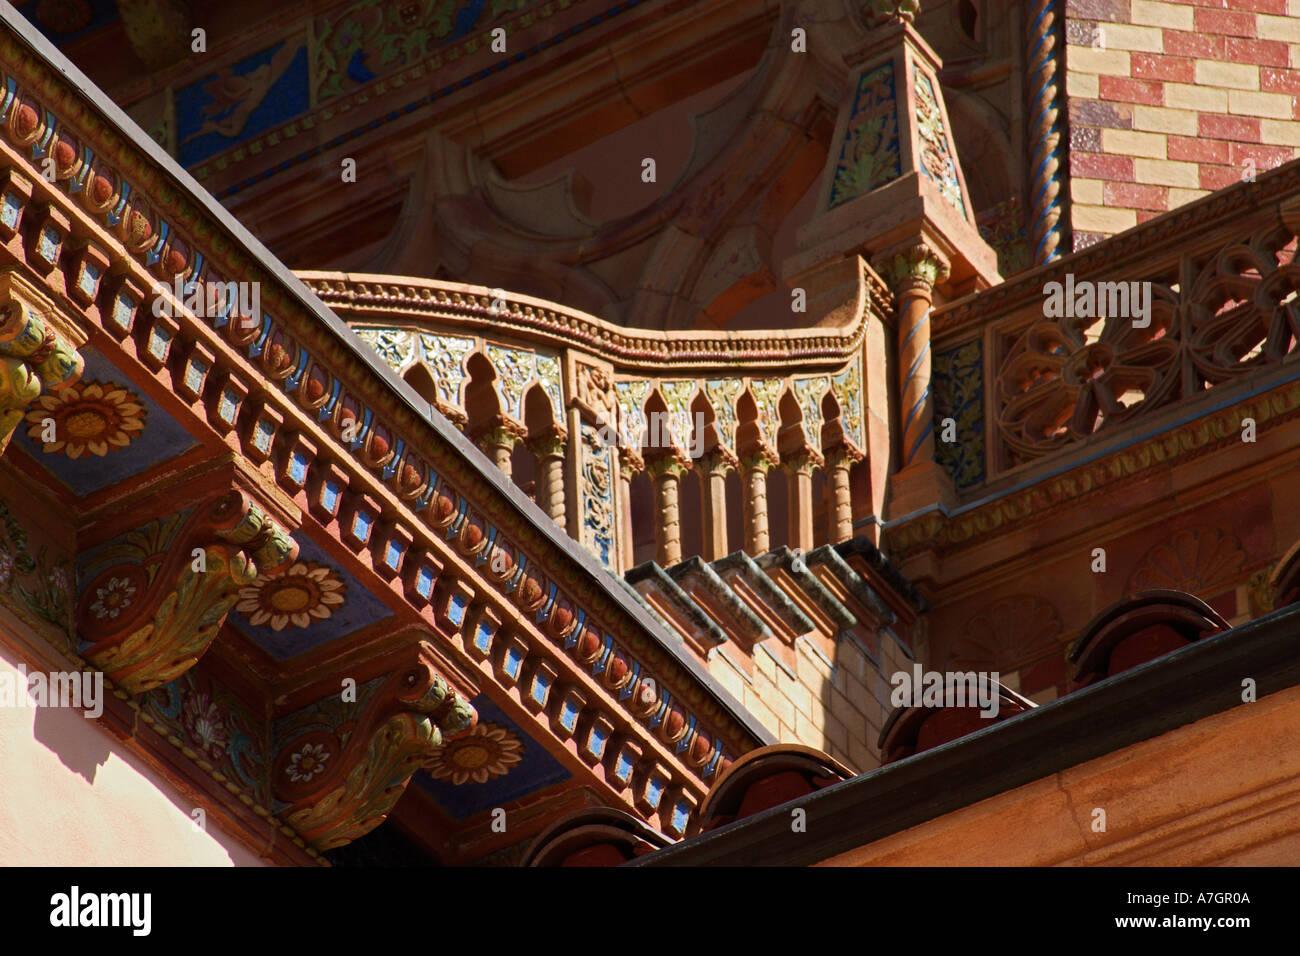 Architectural details of Ca d Zan Mansion, home, John & Mable Ringling, Sarasota, Florida Stock Photo